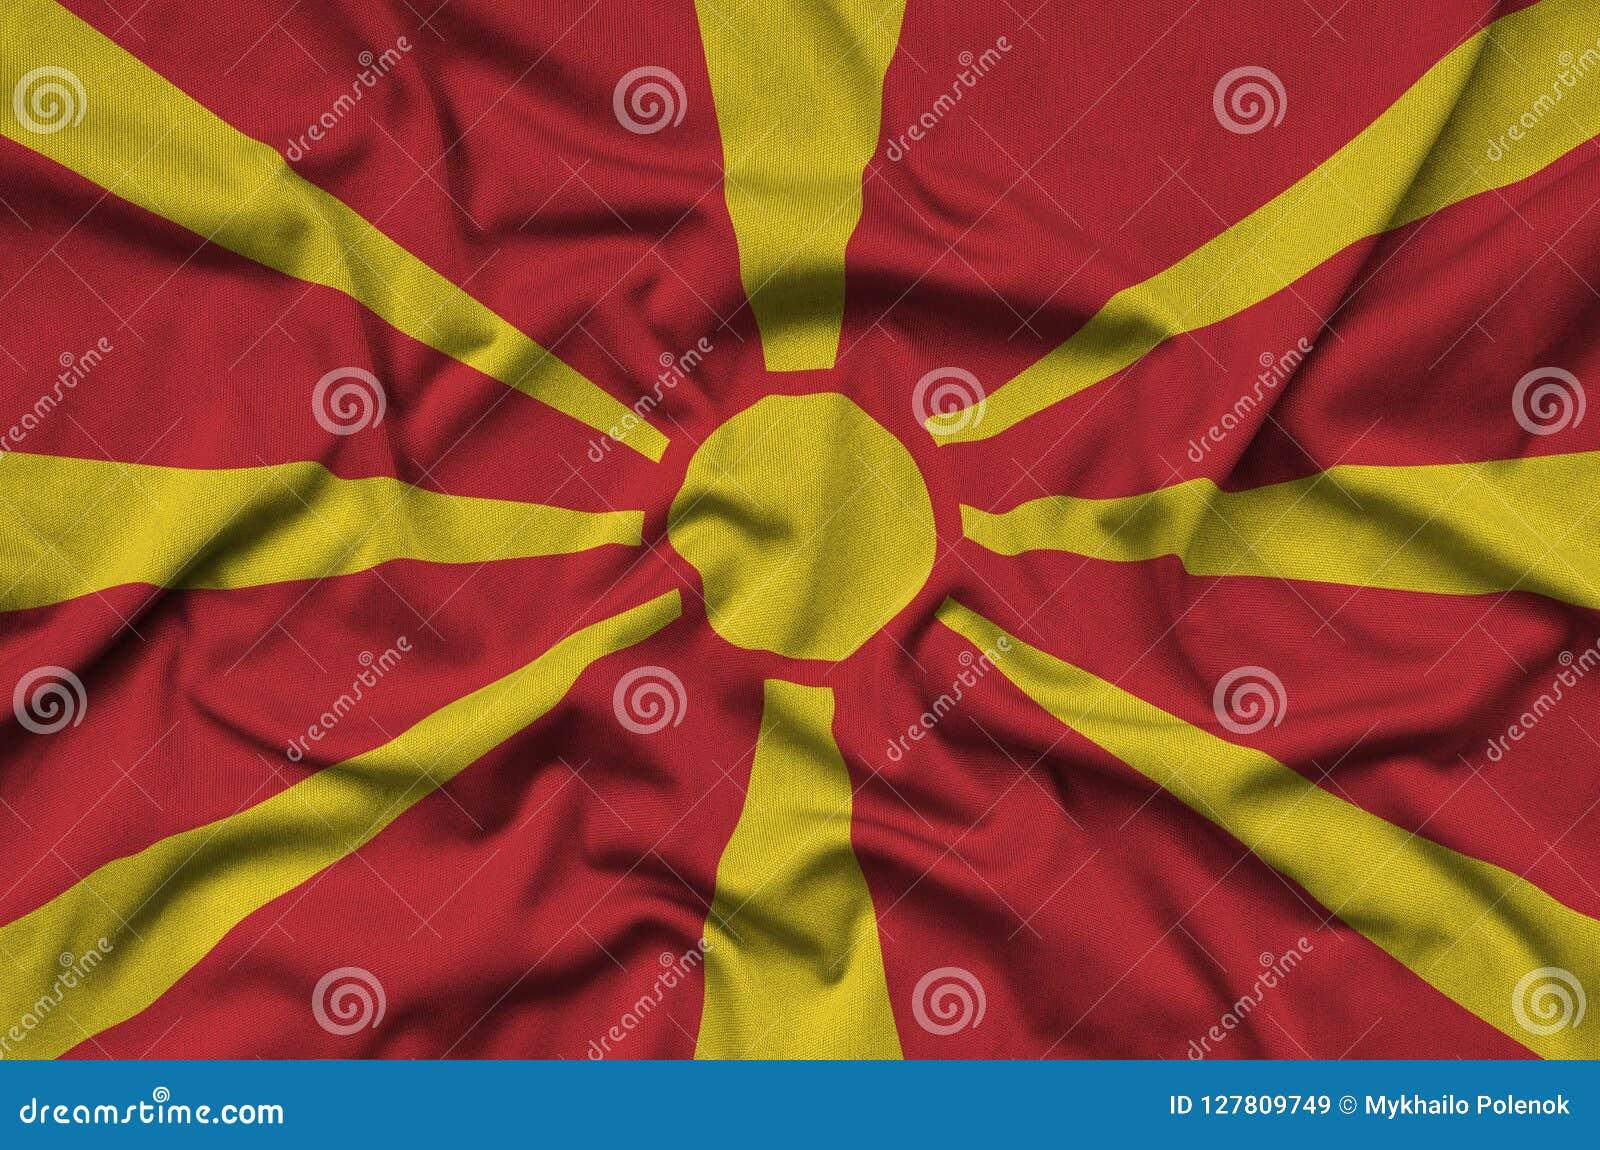 Флаг македонии показан на ткани ткани спорт с много створок Знамя команды спорта